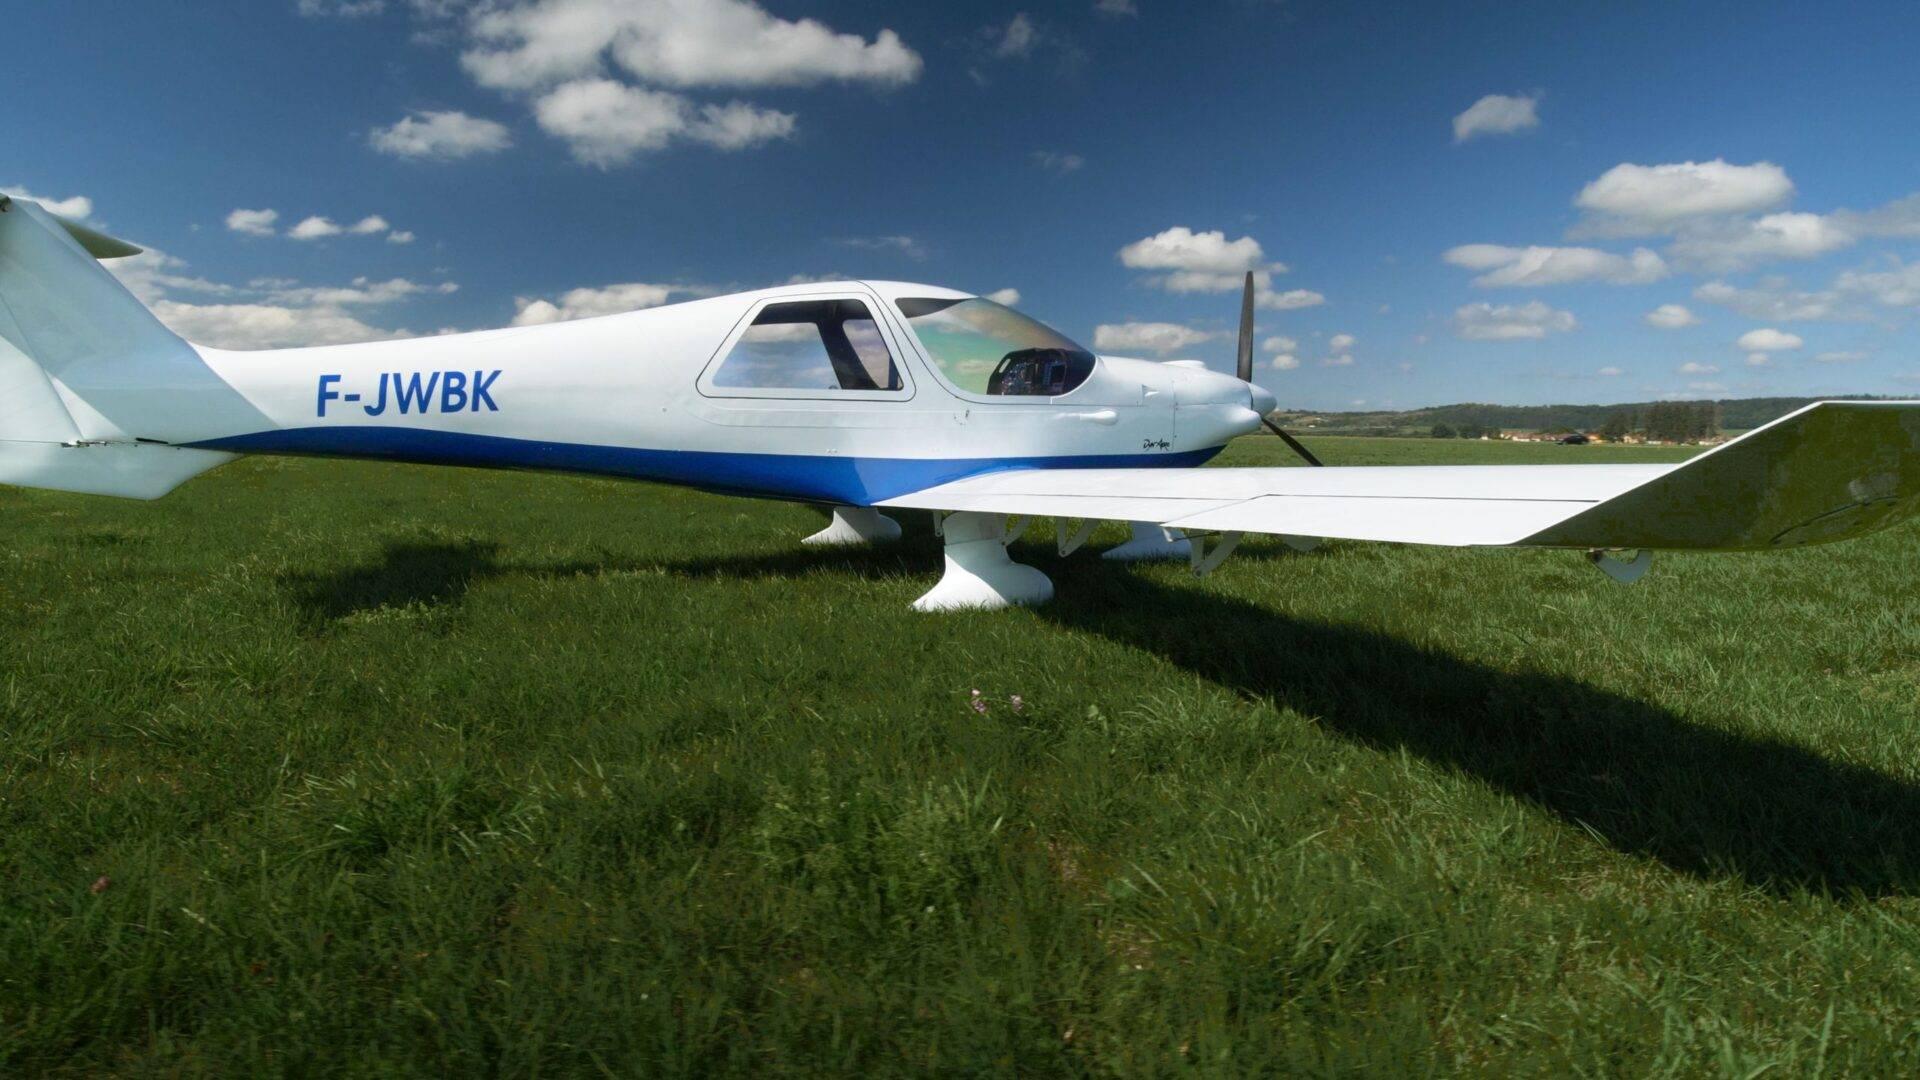 Modele PICK-UP EVOLUTION  MCR Evolution - SE Aviation Aircraft   La référence mondiale en MCR